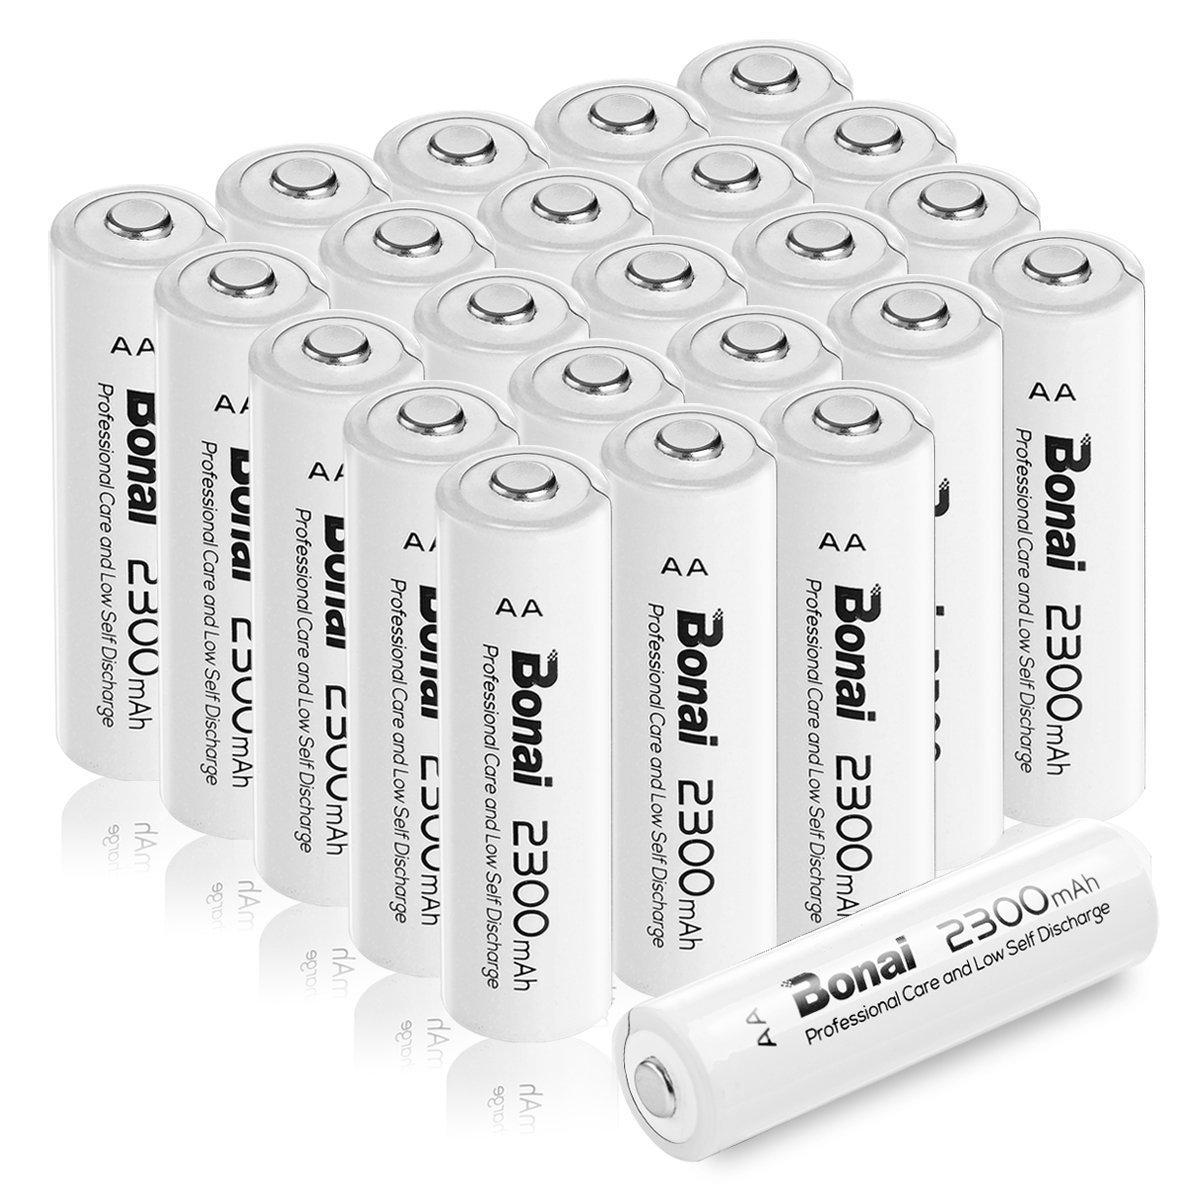 [新品/送料無料] Bonai 単3形 充電池 充電式ニッケル水素電池 24個パック PSE/CE取得 UL認証済み(高容量2300mAh 約1200回使用可能)_画像1